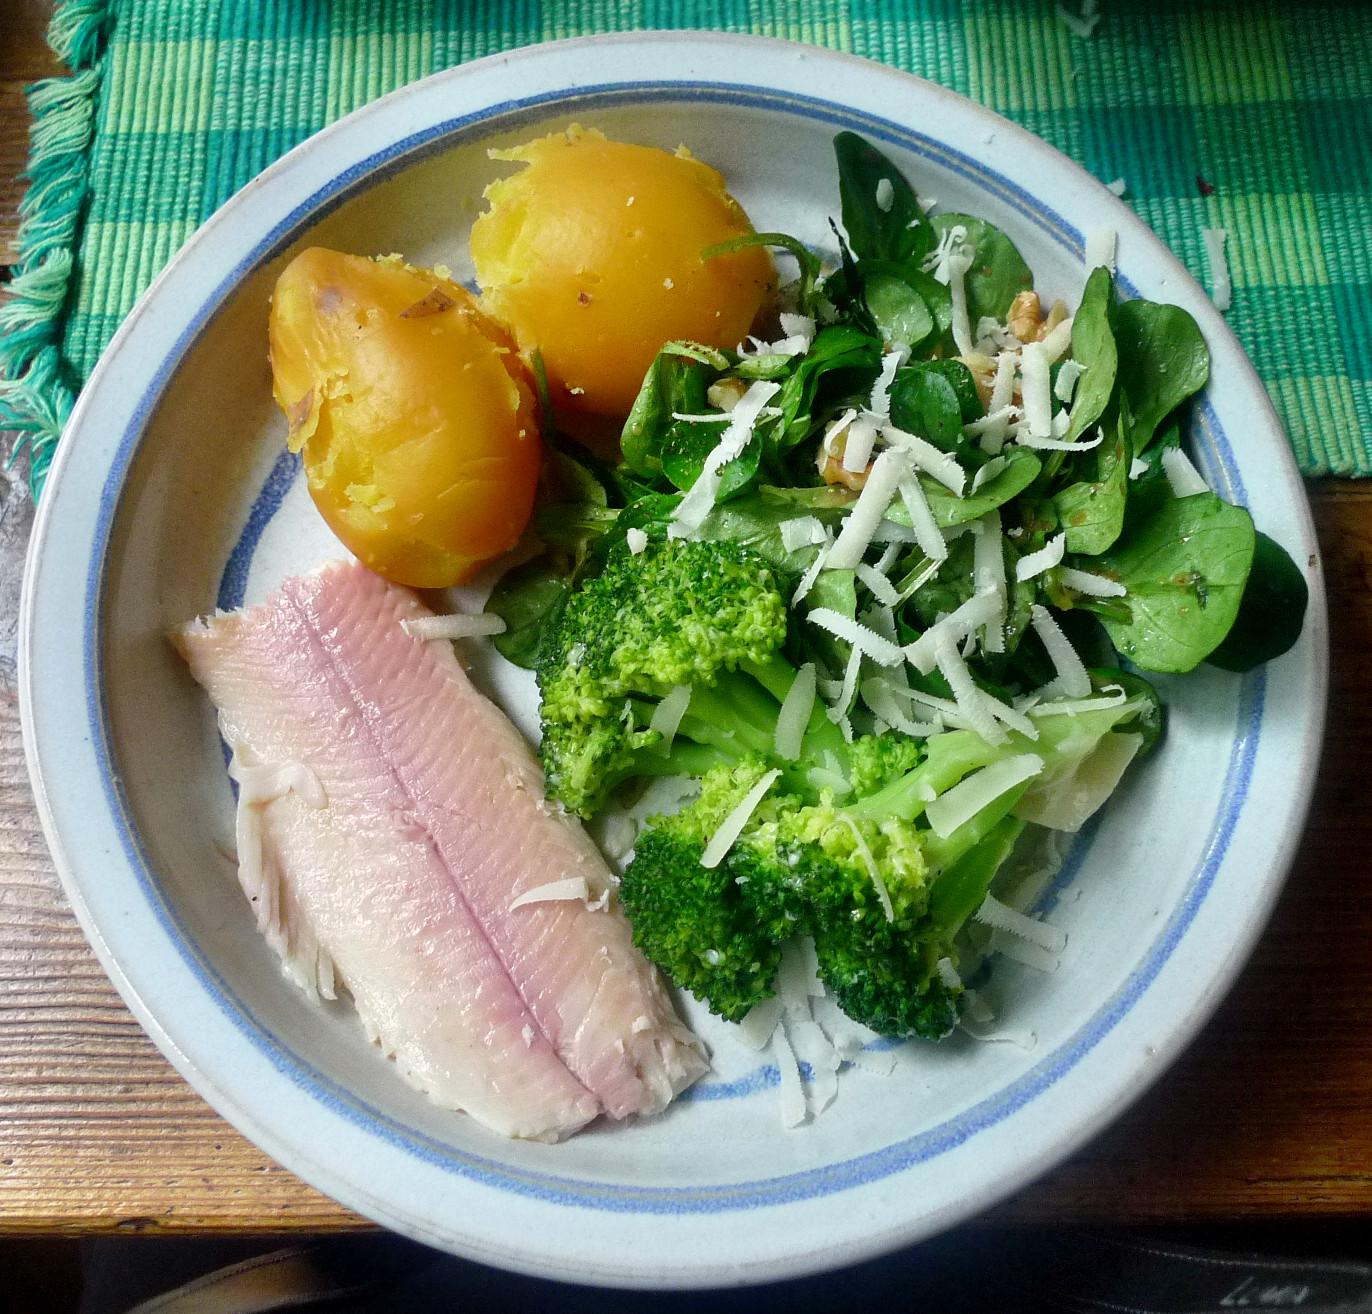 1.11.2013-Feldsalat-Brokkoli-Kartoffel-geräucherte Forelle